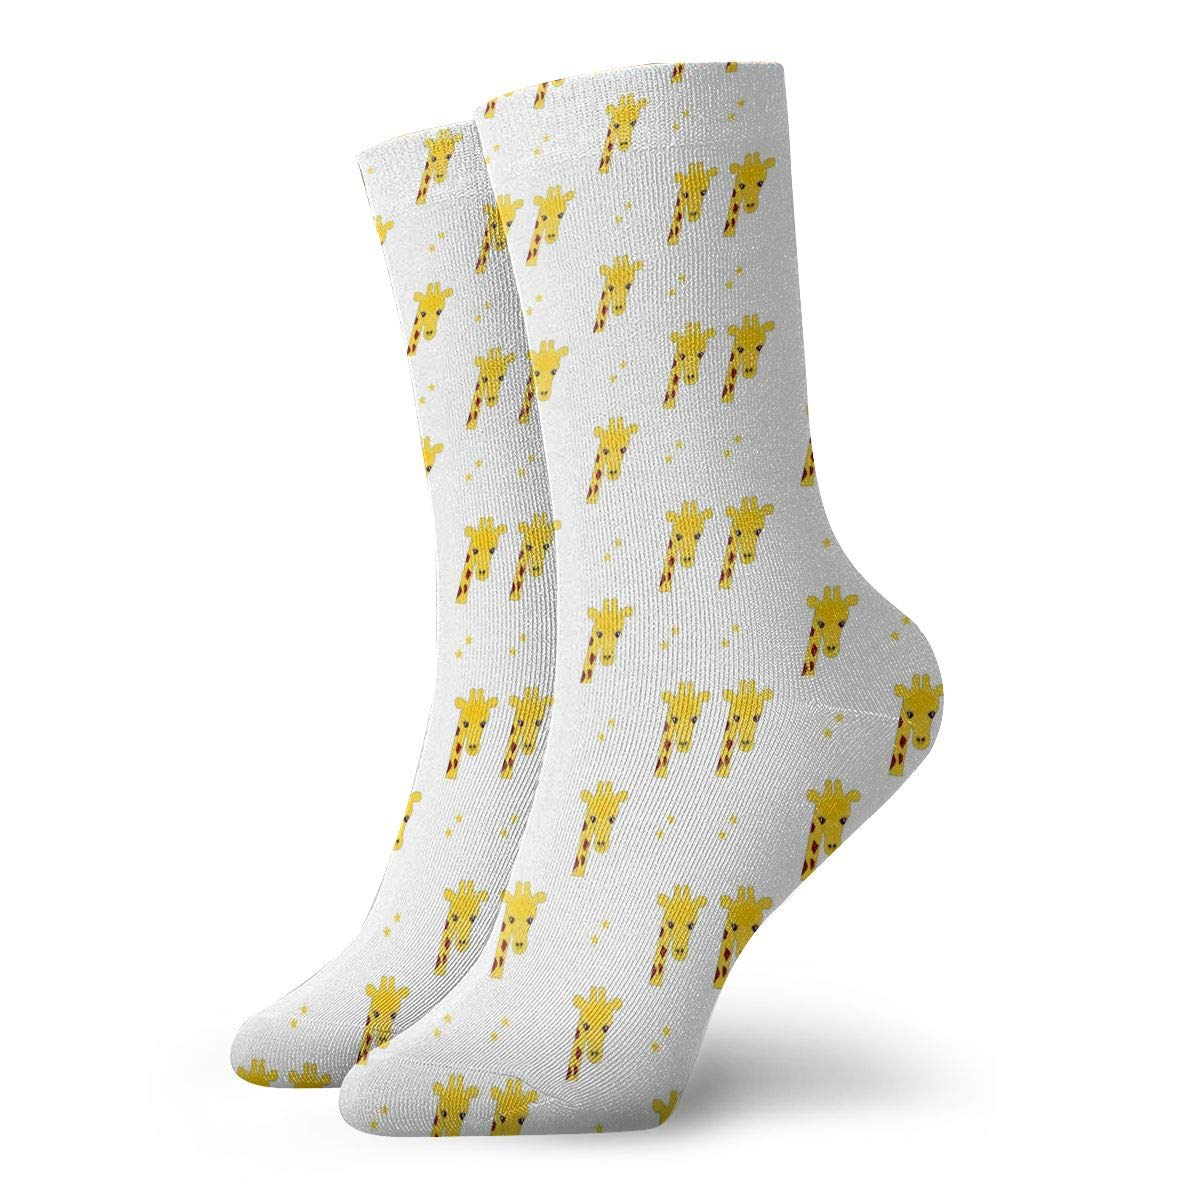 Unisex High Ankle Cushion Crew Socks Giraffe Cartoon Pattern Casual Sport Socks